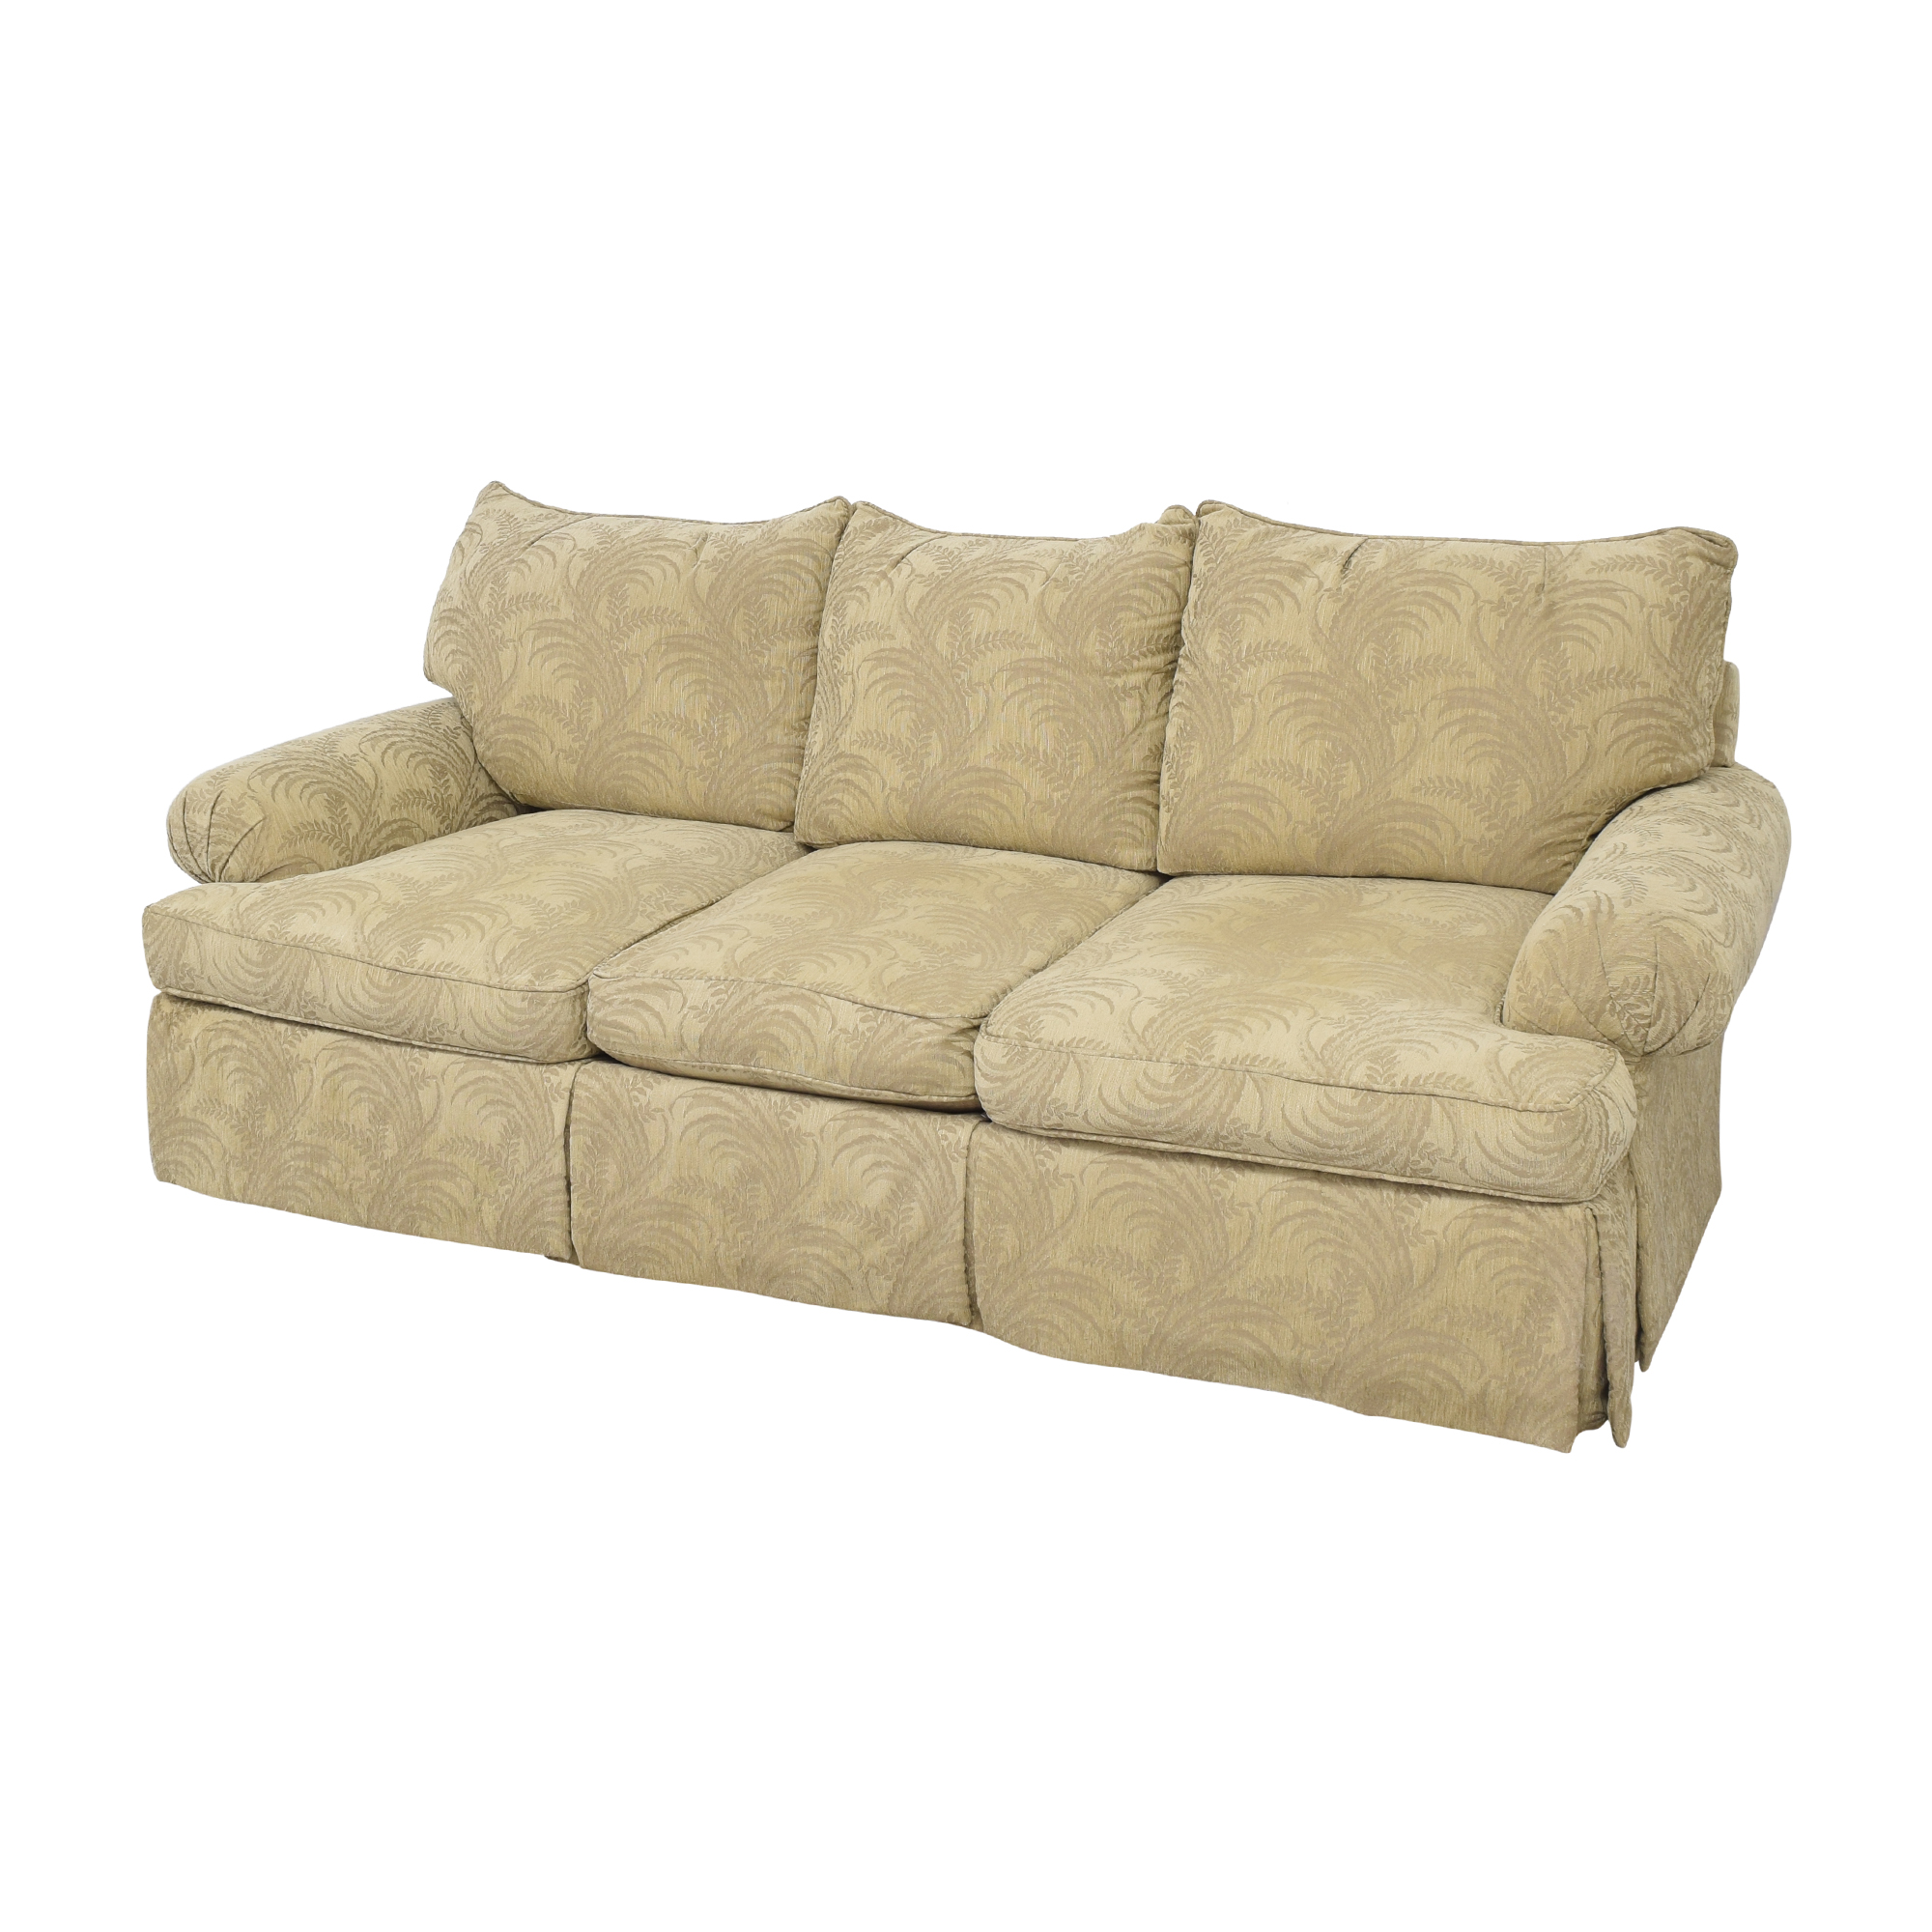 shop Bernhardt Roll Arm Three Cushion Sofa Bernhardt Classic Sofas